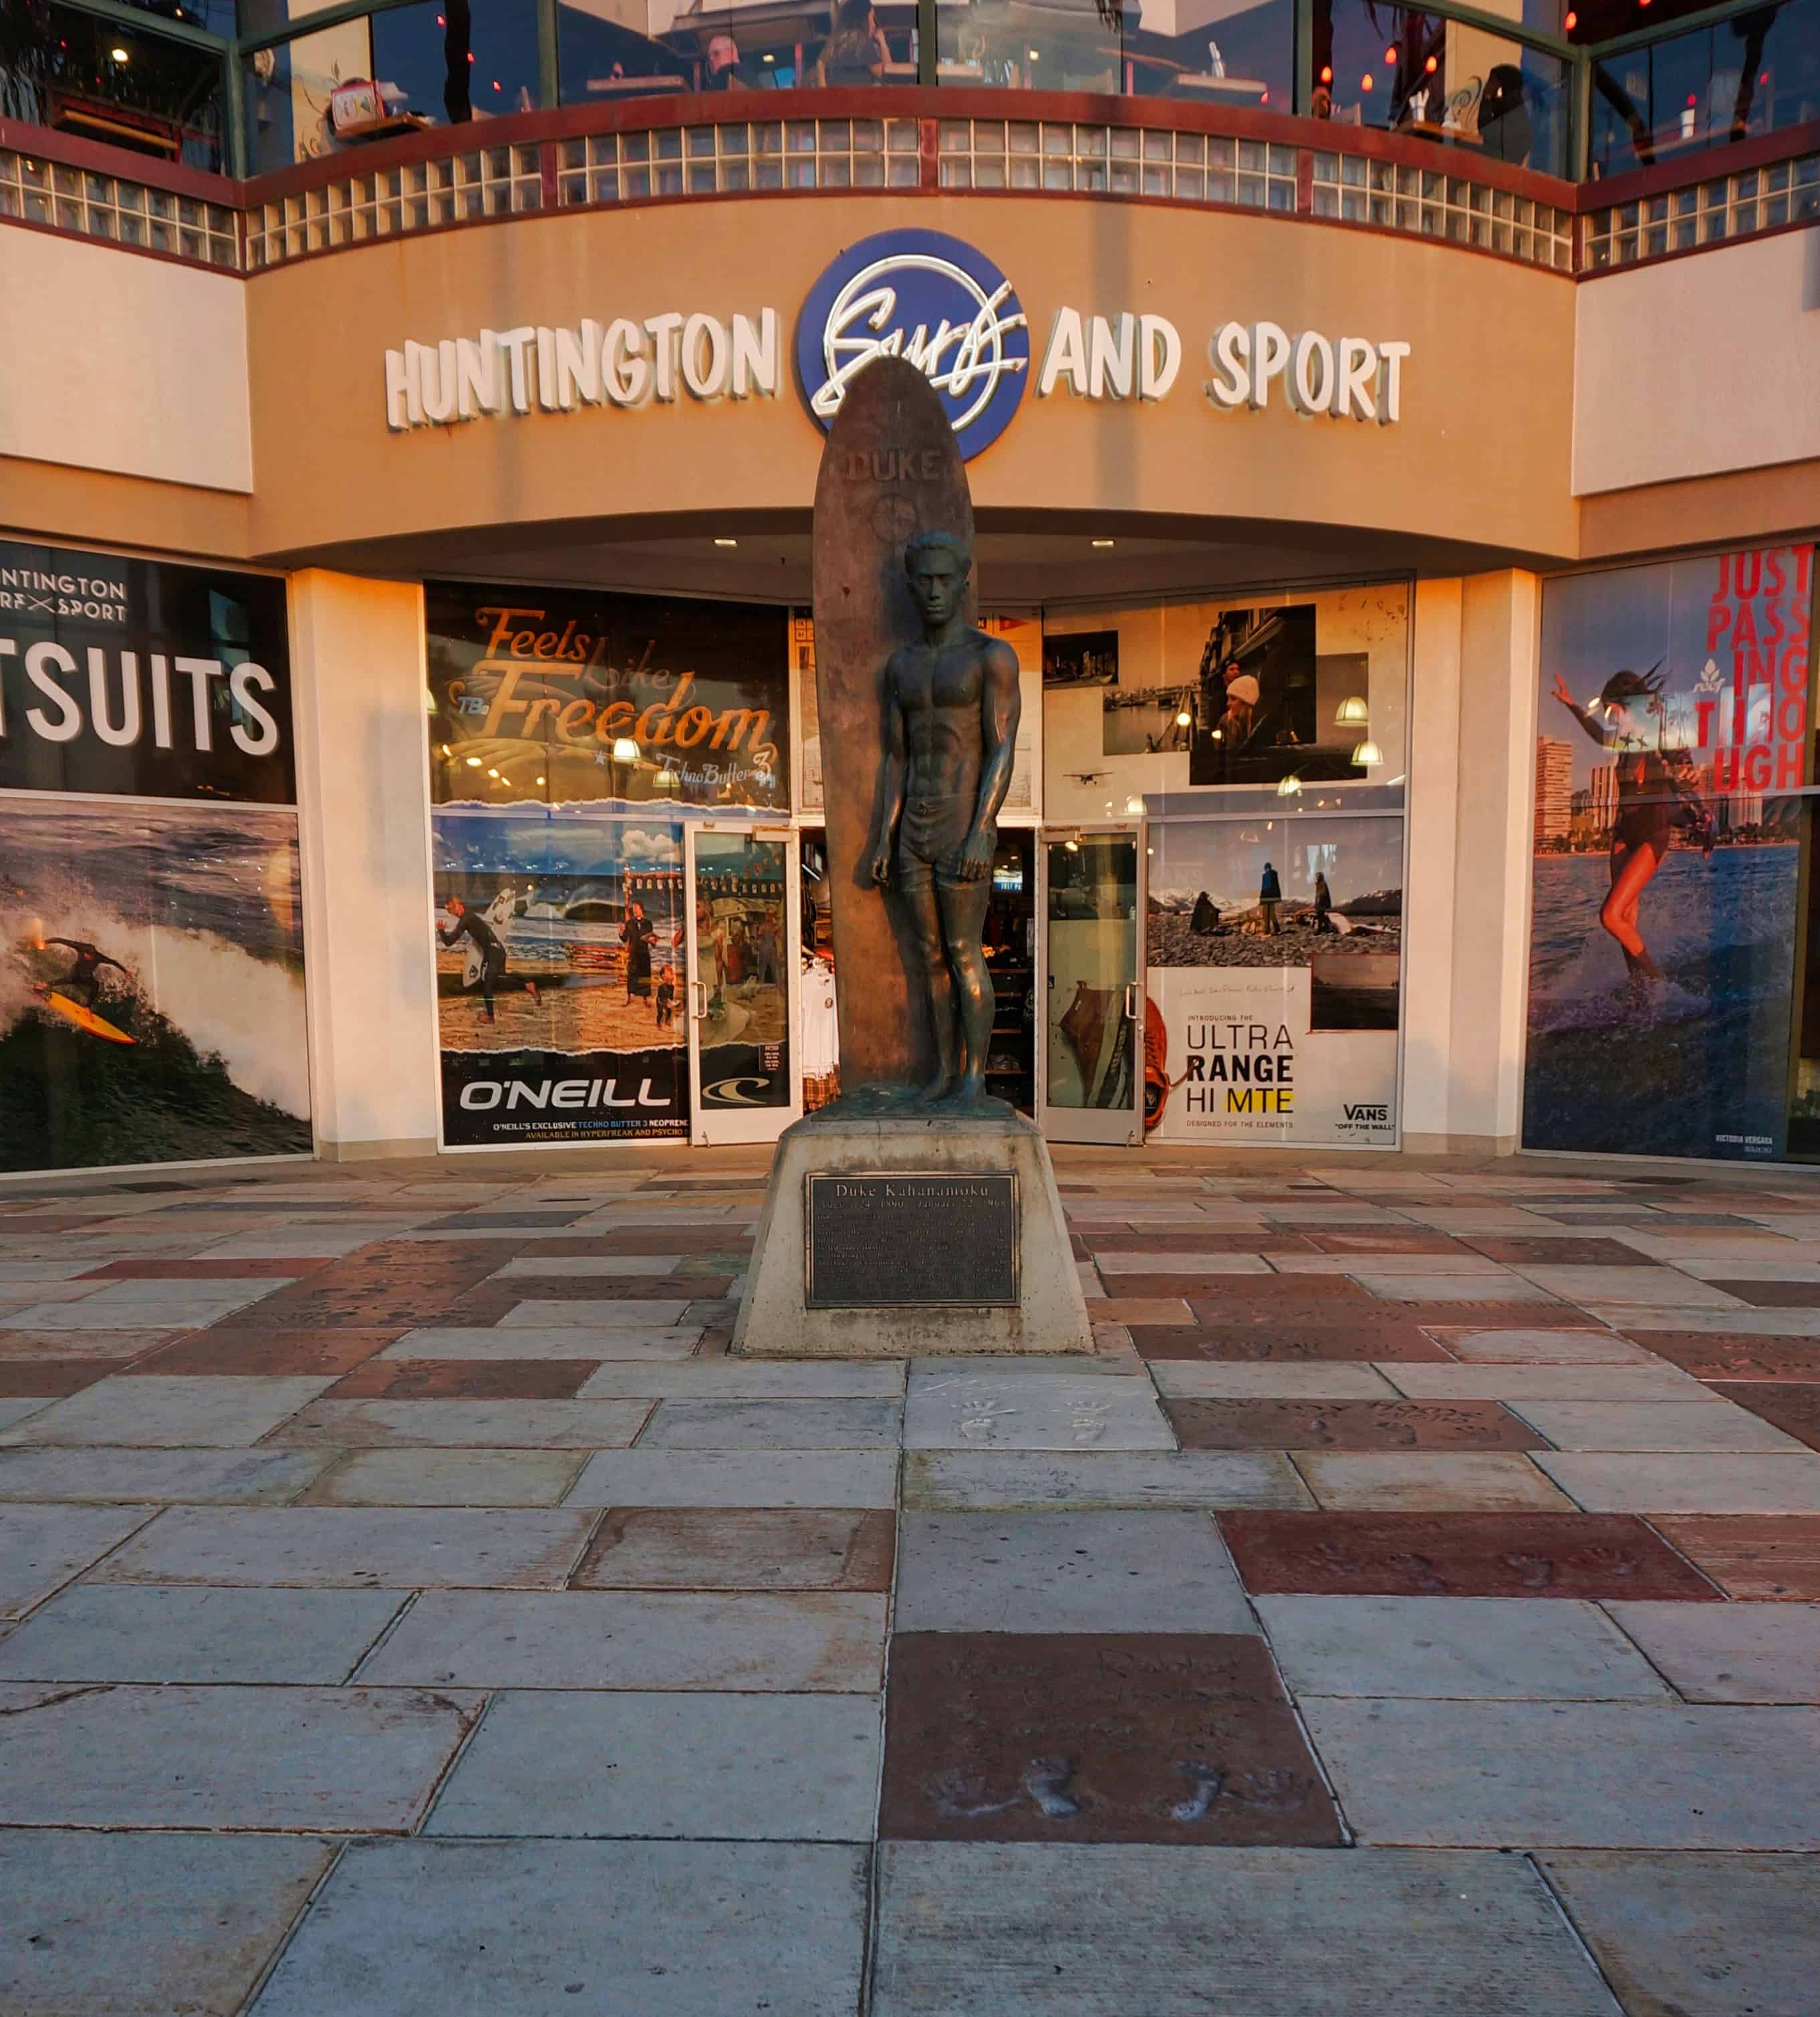 3 Days in Huntington Beach - Surf History